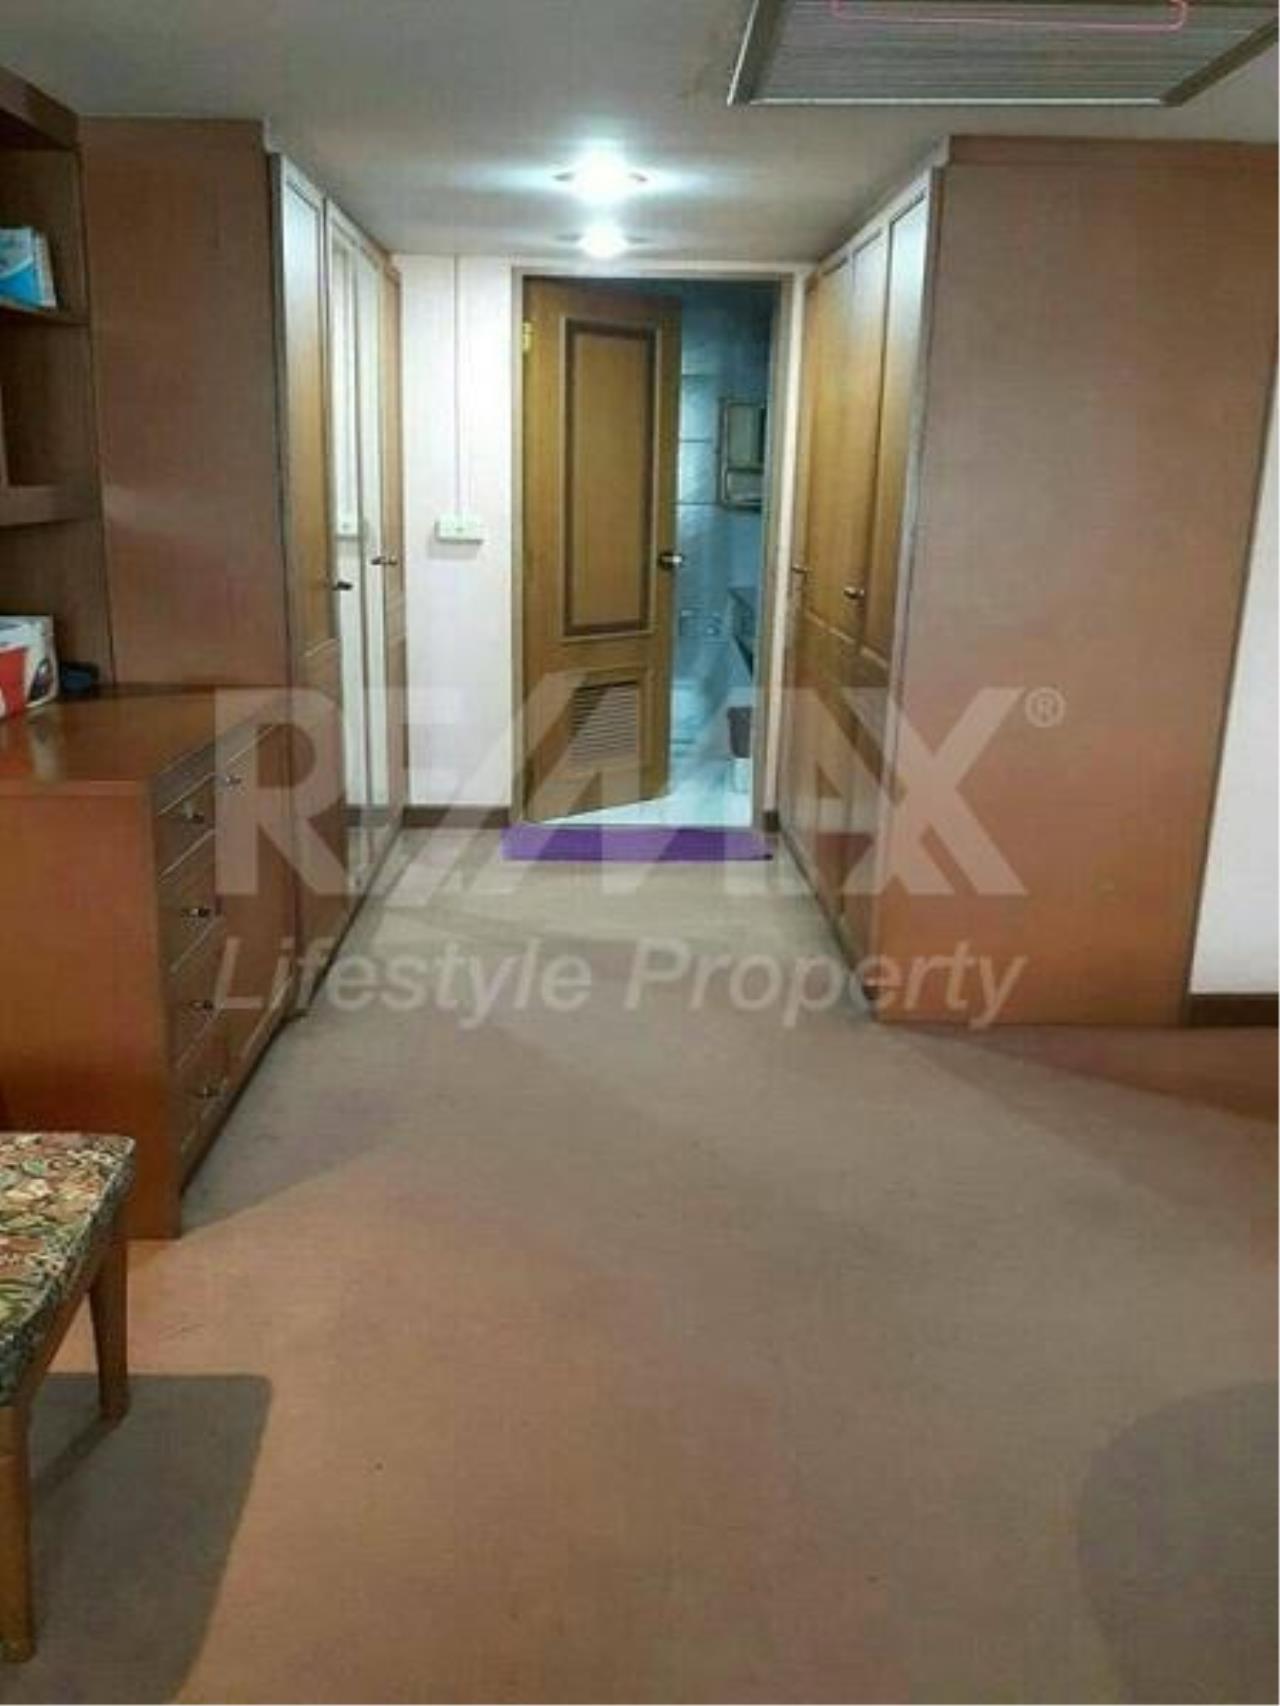 RE/MAX LifeStyle Property Agency's Omni Tower Sukhumvit Nana 9